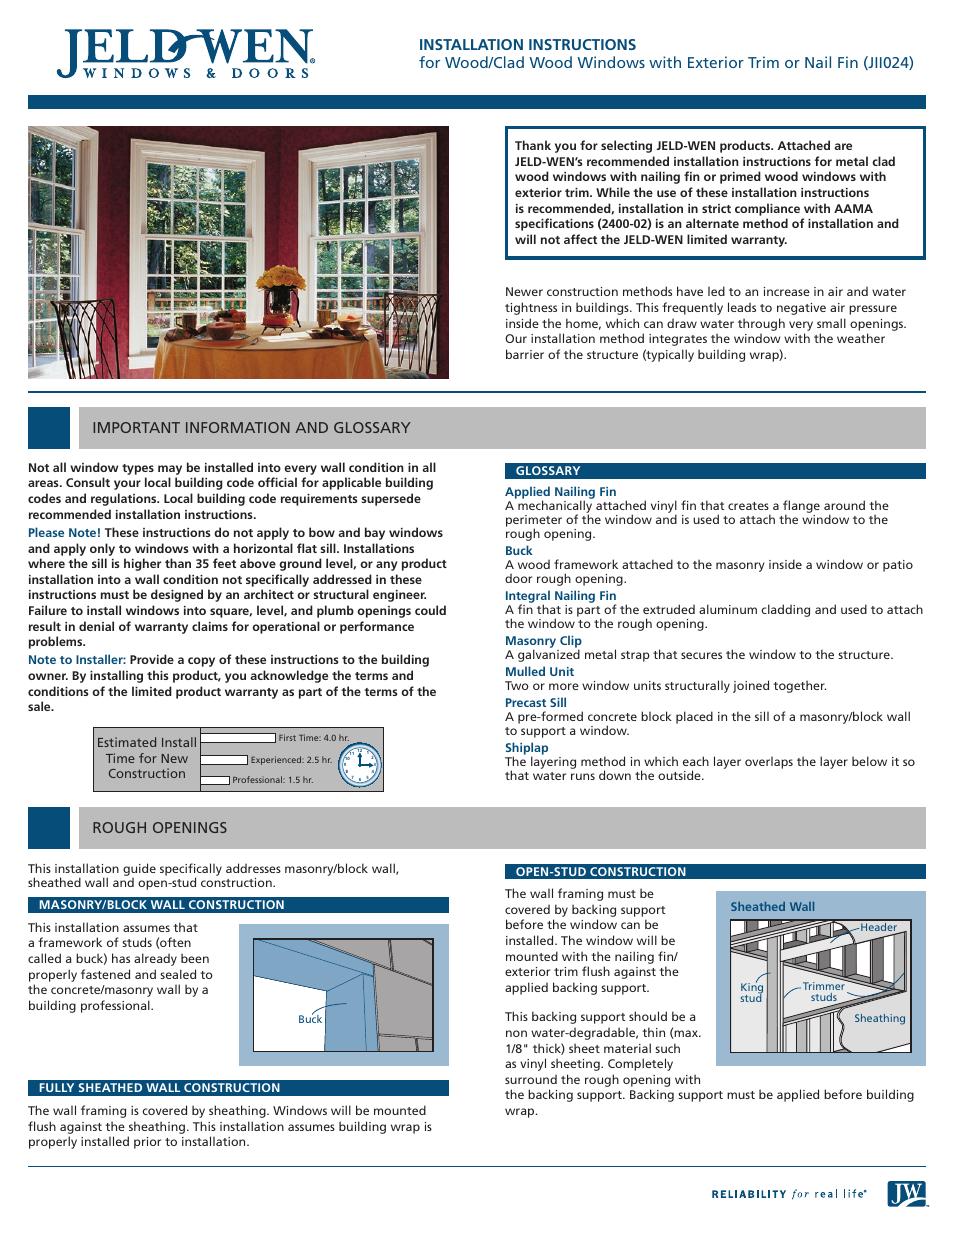 JELD-WEN JII024 Wood/Clad Wood Windows with Exterior Trim or